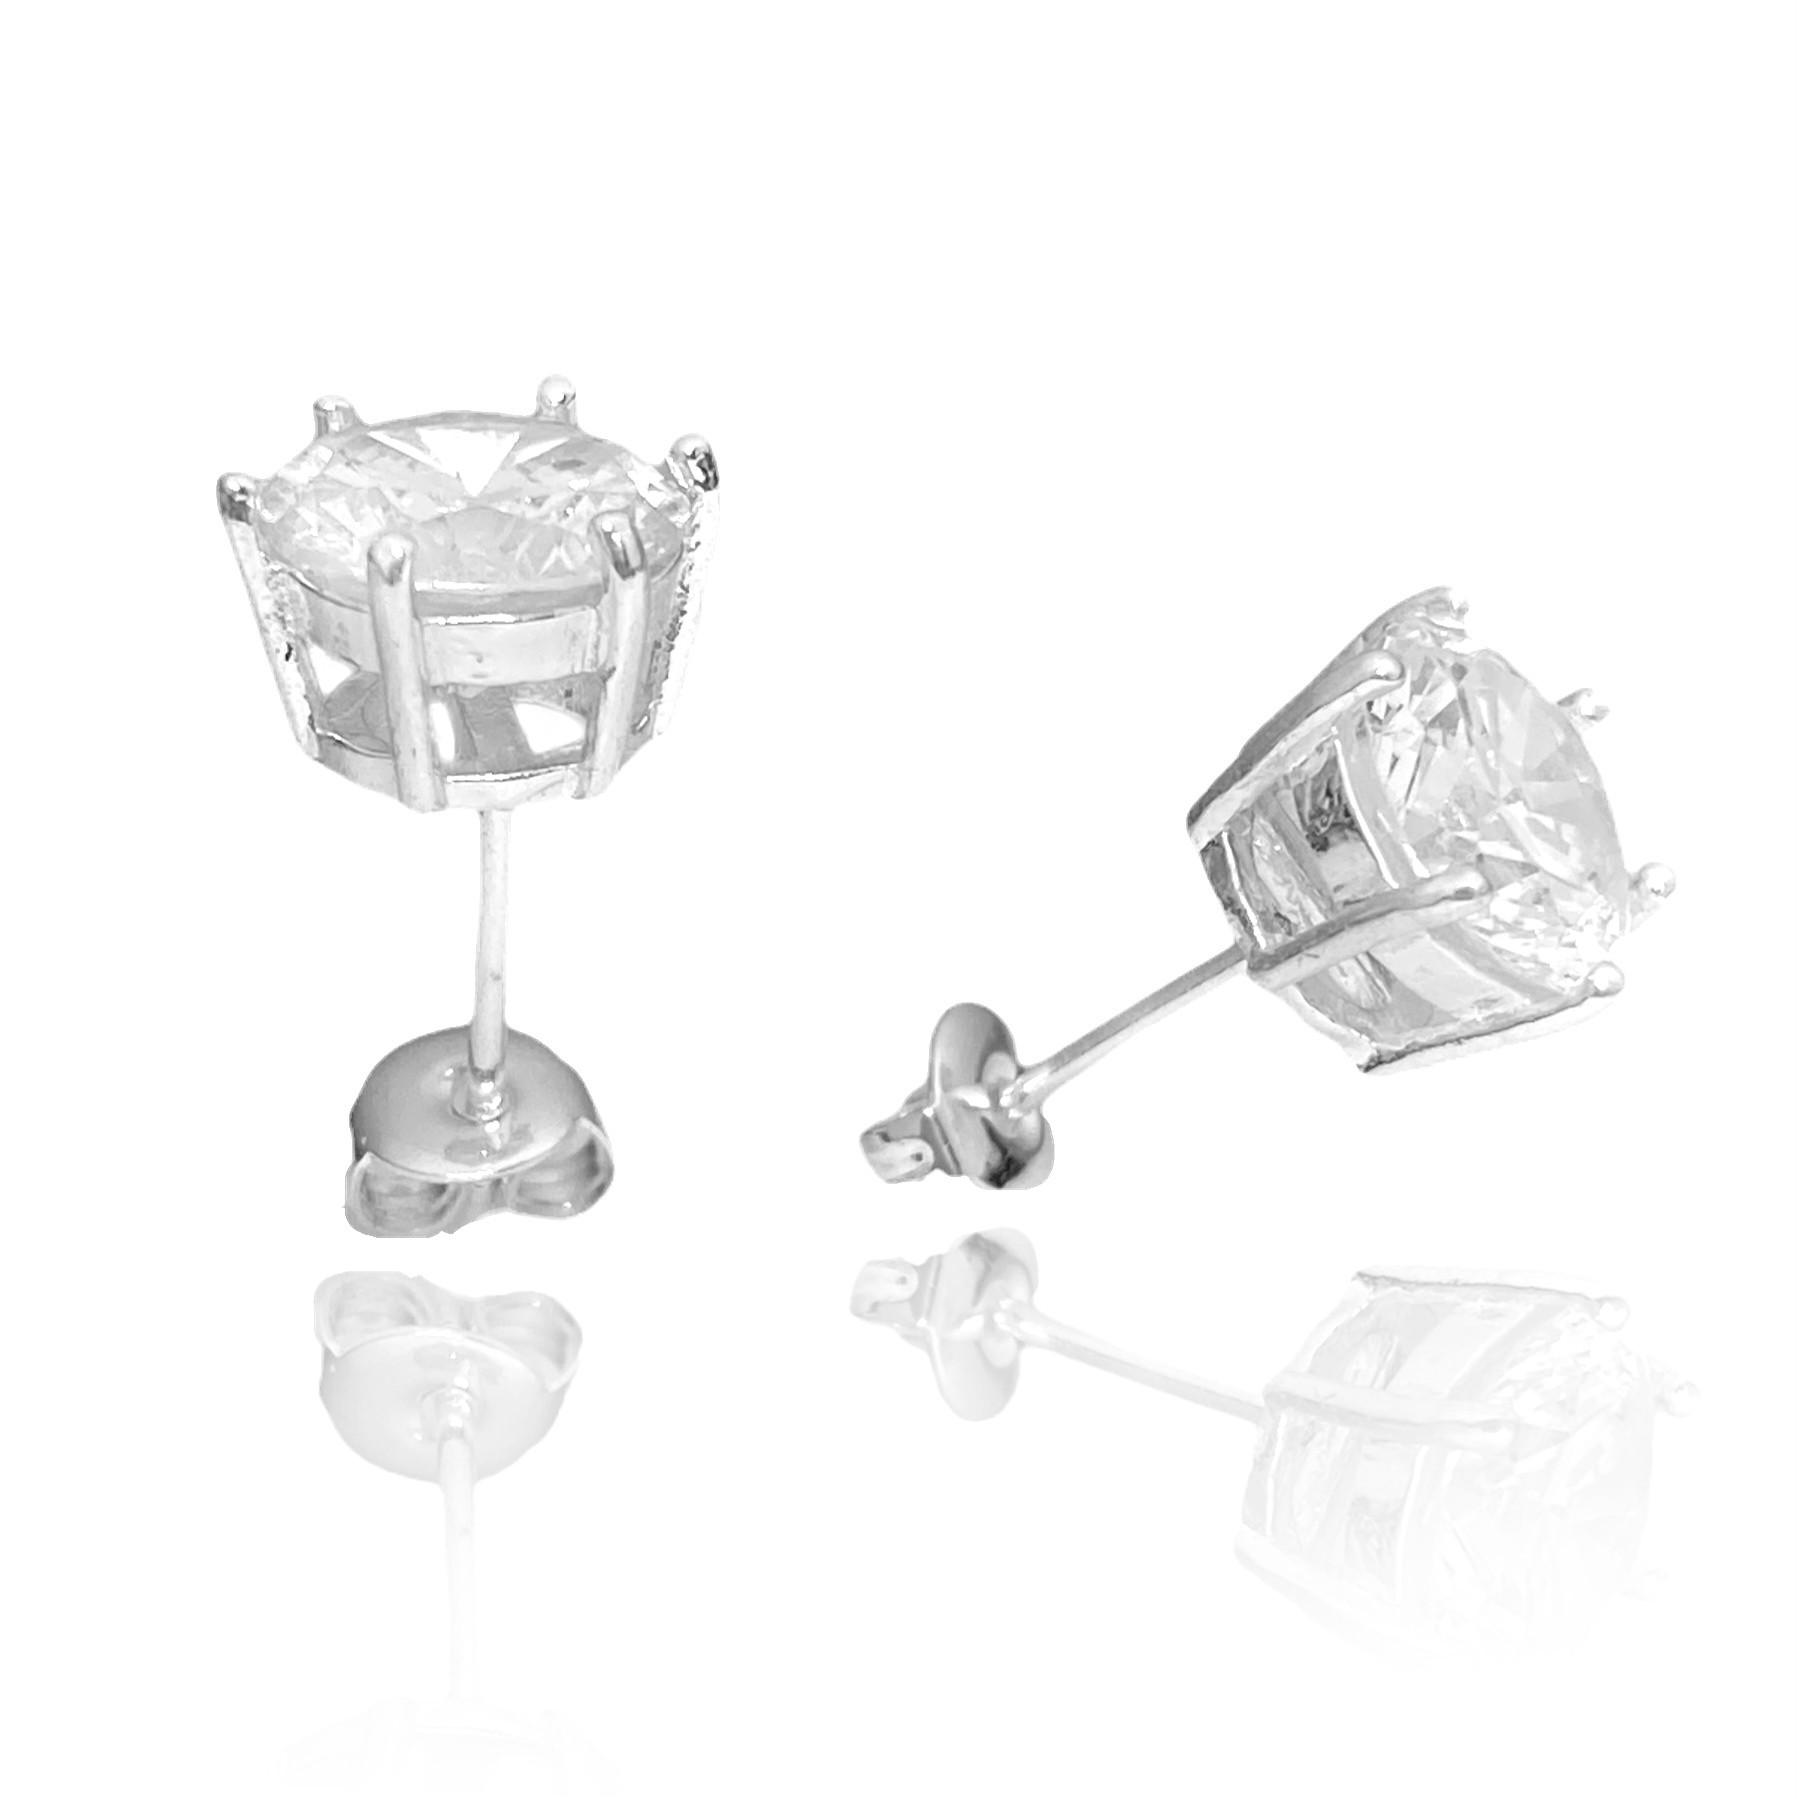 Brinco Pedra de Zircônia Circular 7,5mm X 7,5mm (Banho Prata 925)